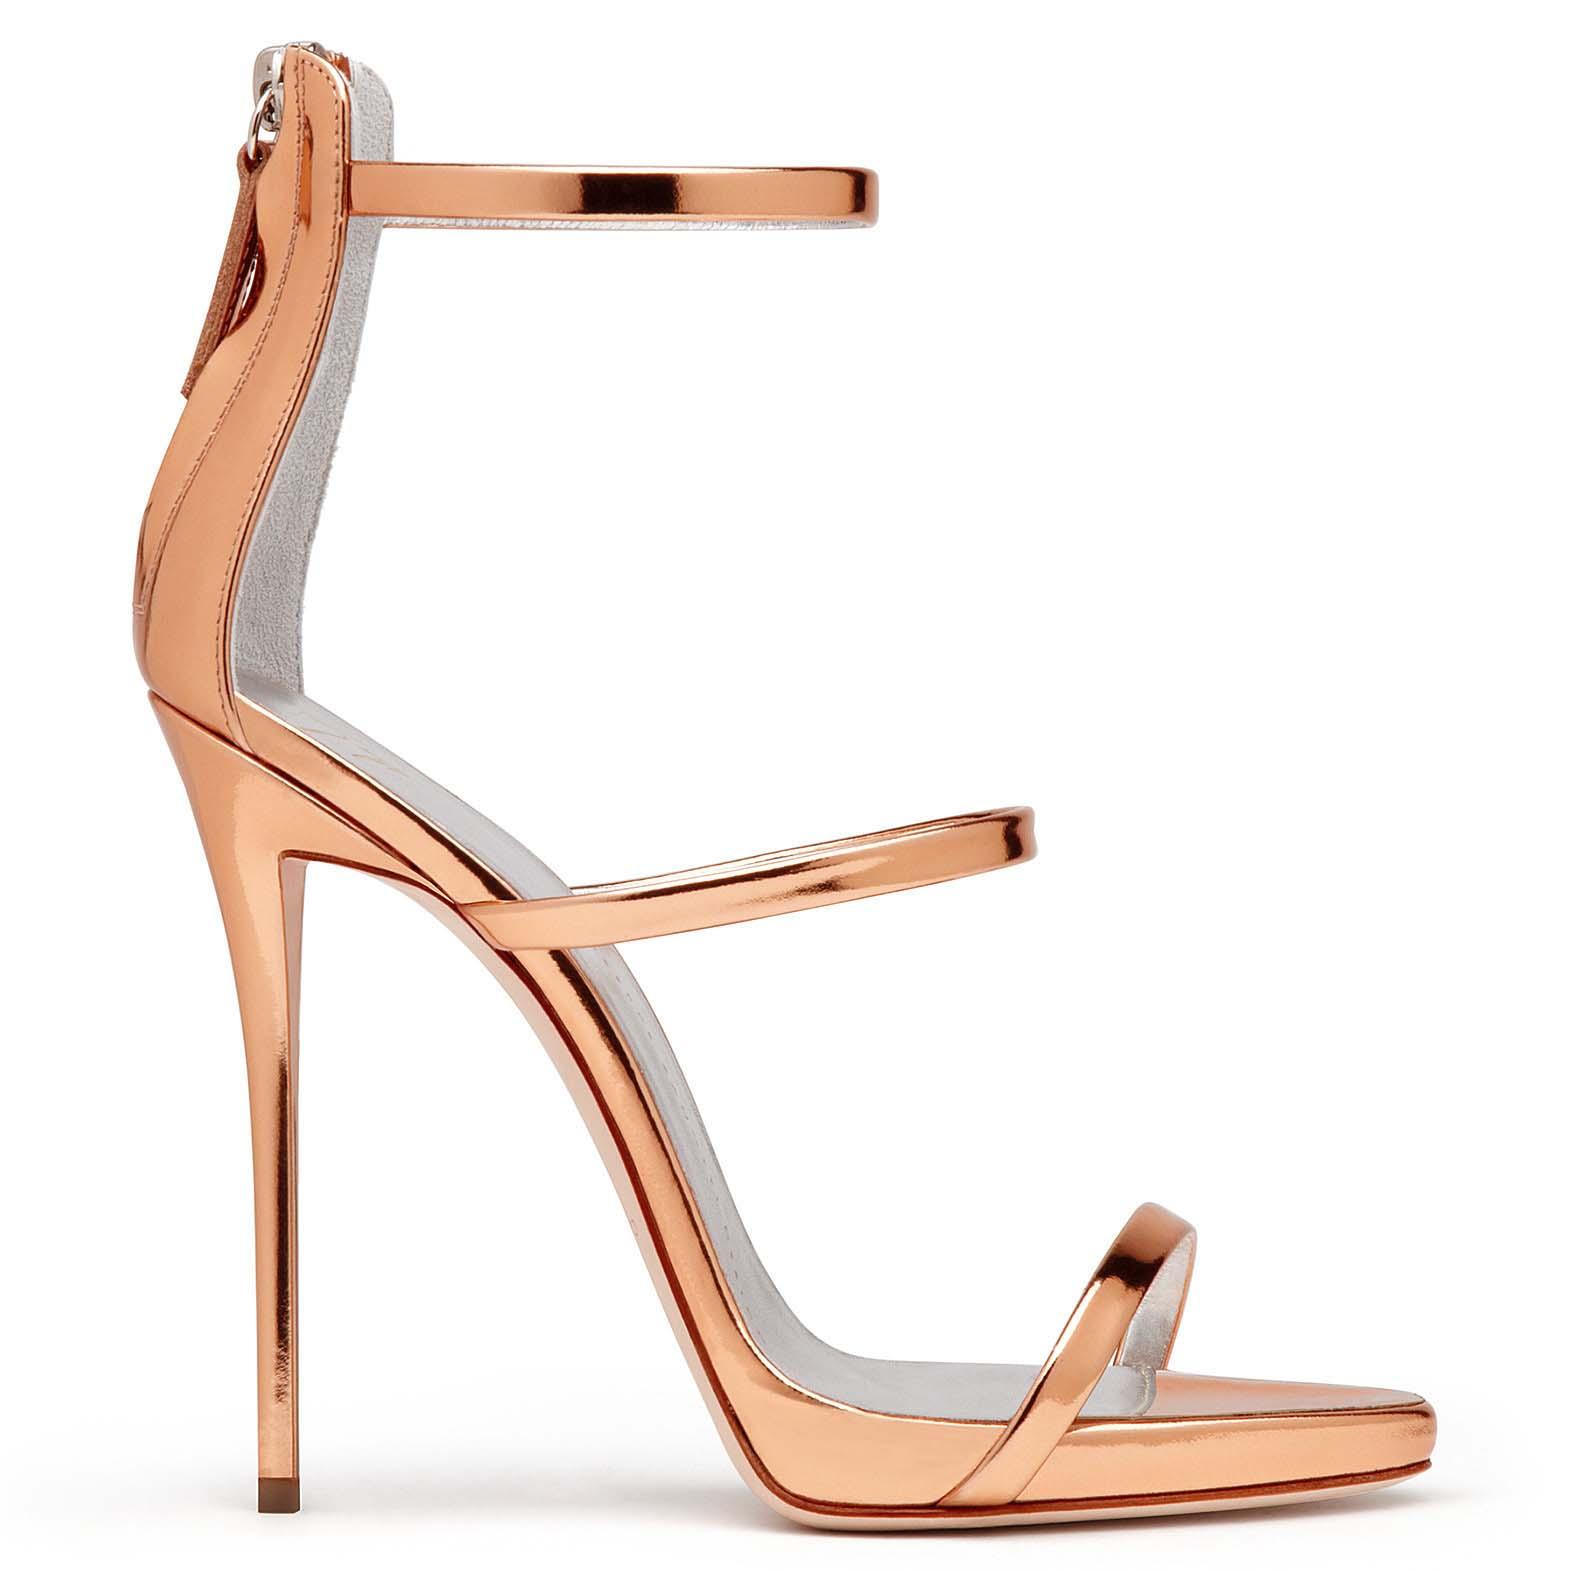 latest-party-wedding-wear-shoes-by-giuseppe-zanotti-2017-4